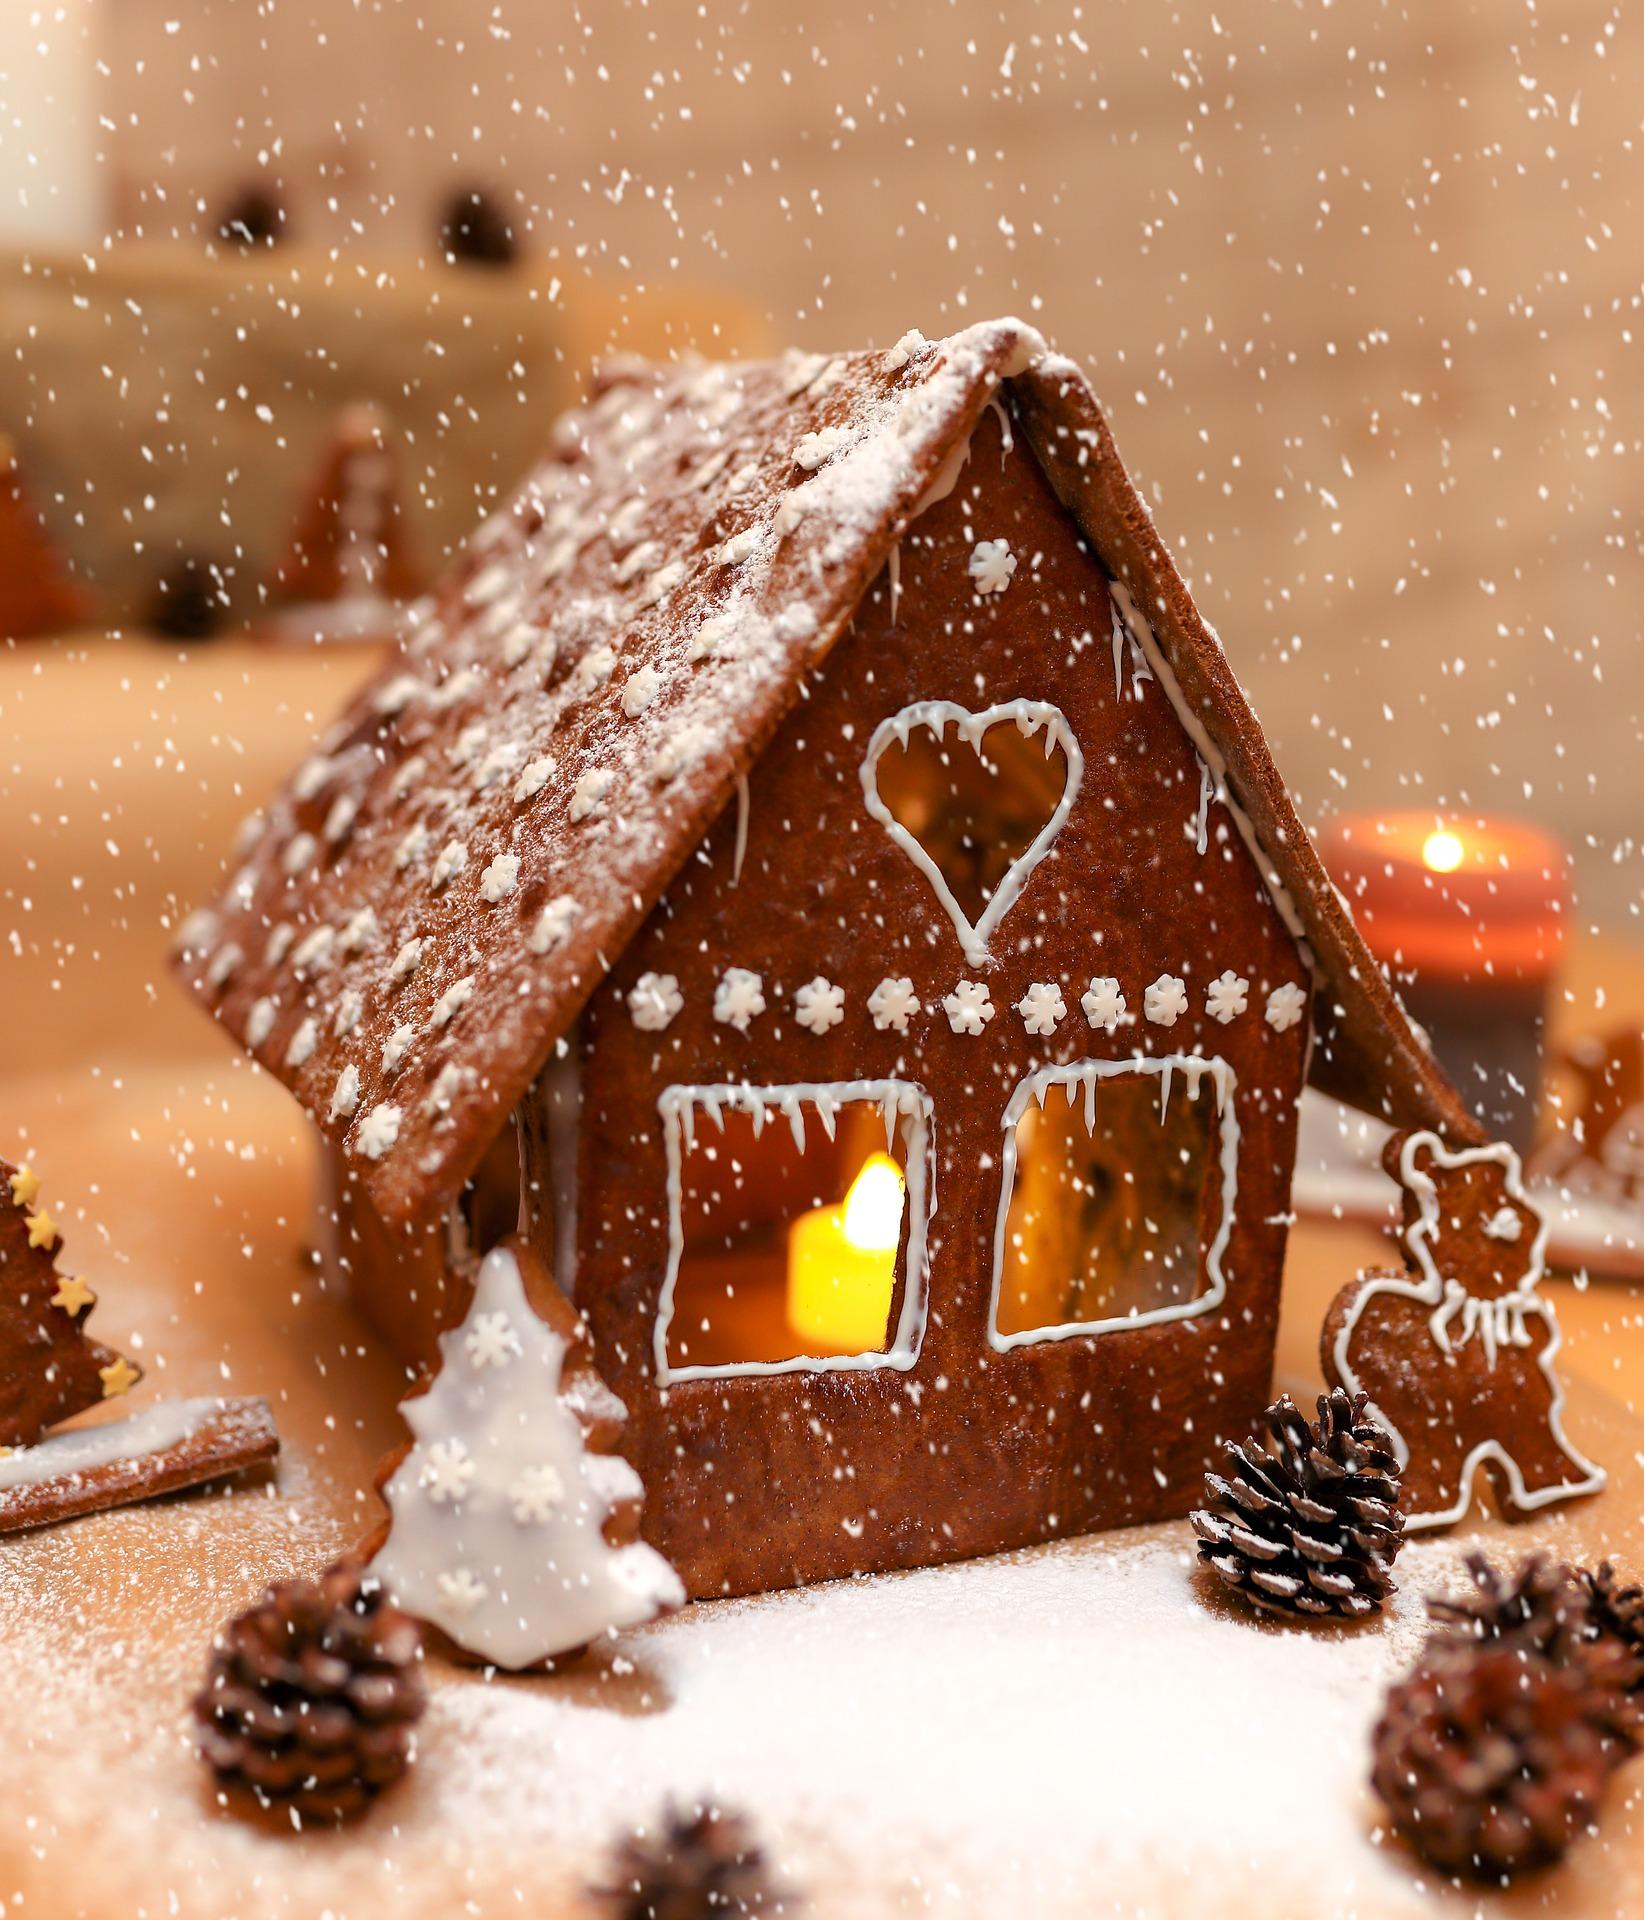 christmas-3830240_1920.jpg